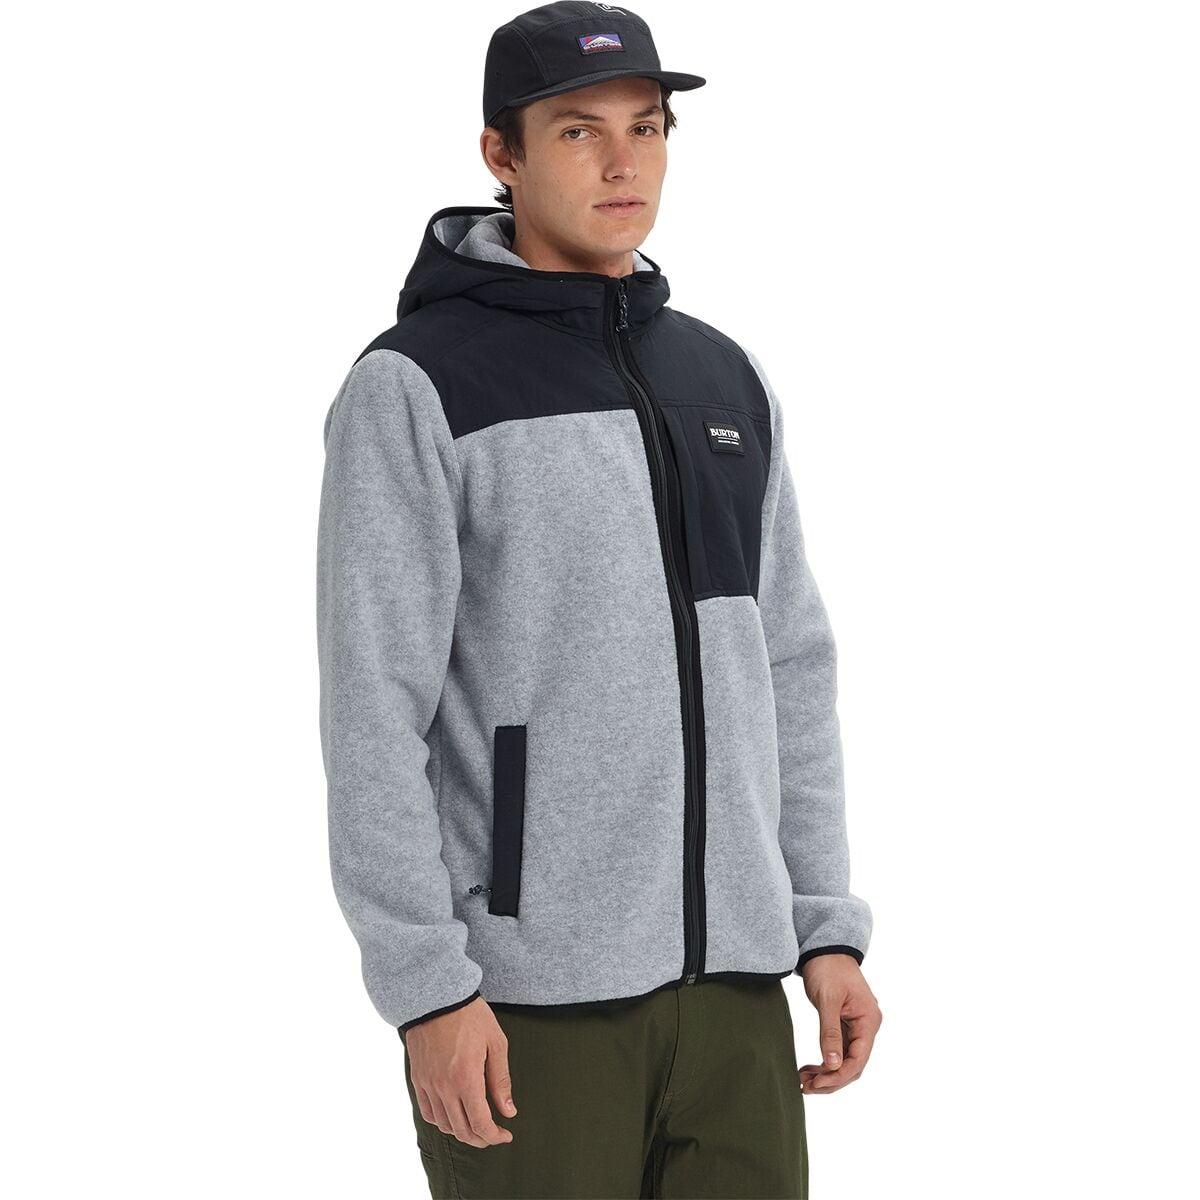 Hearth Hooded Full-Zip Jacket - Men